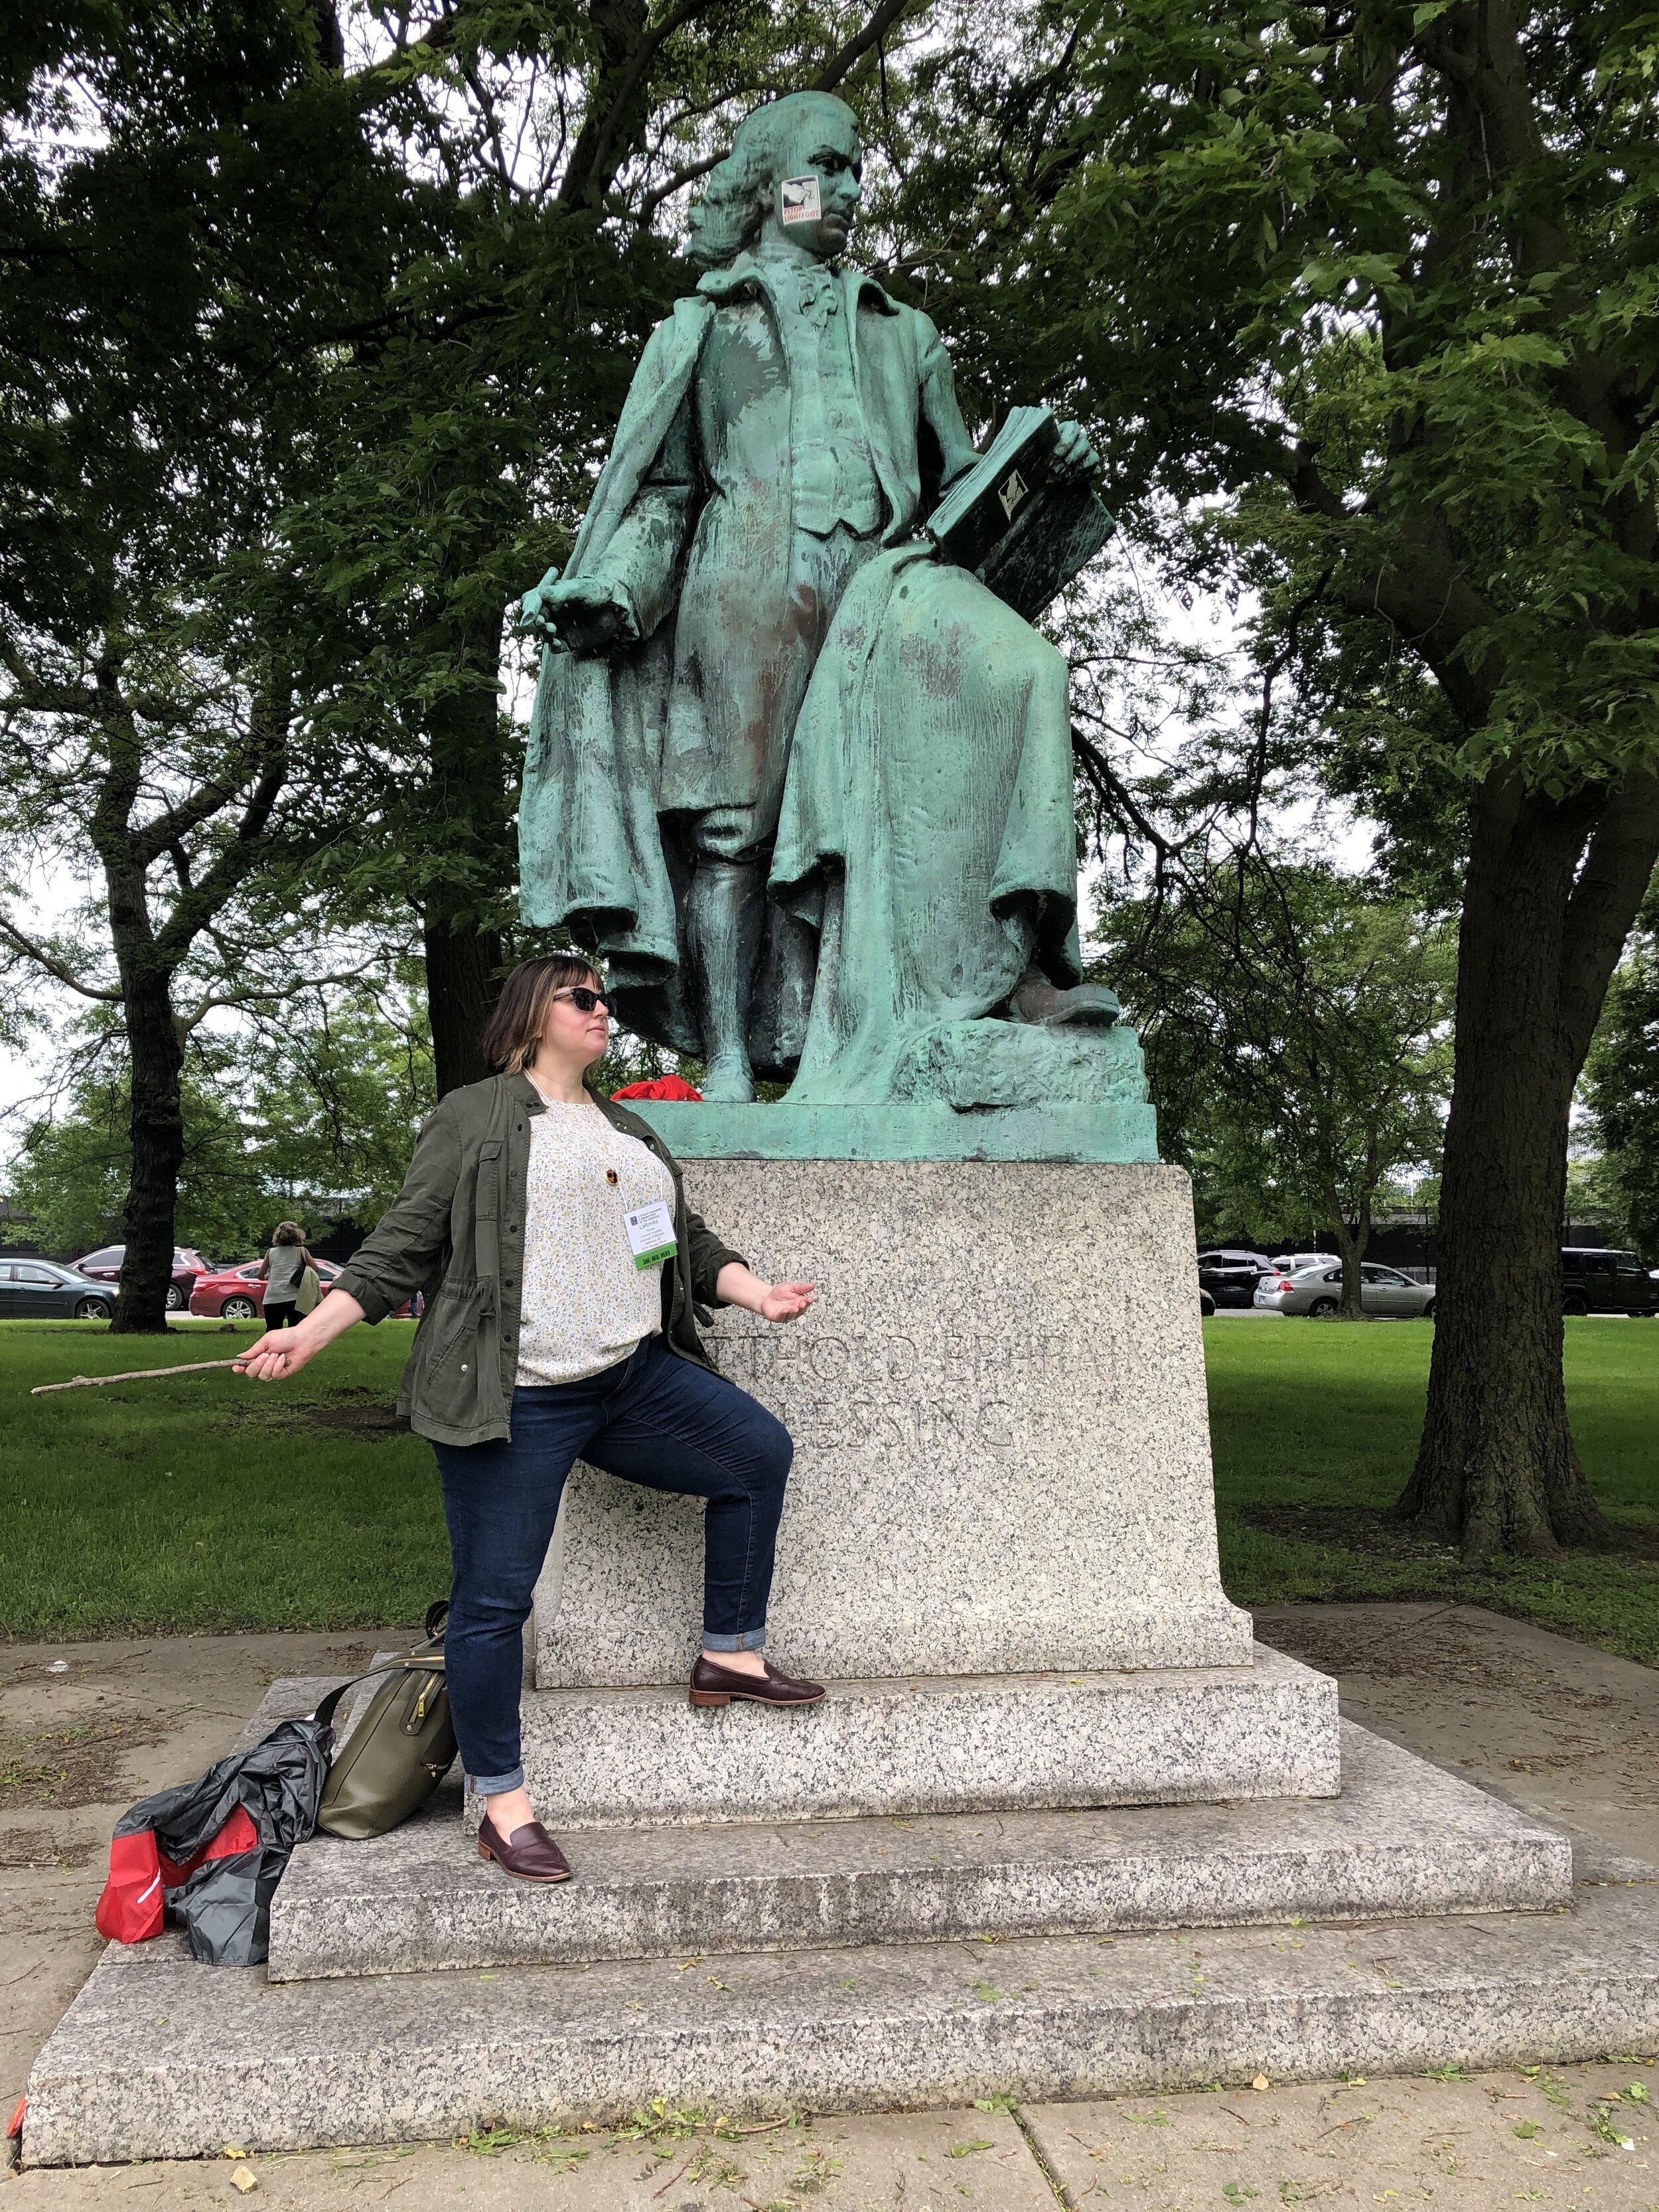 Imitating Lessing - photo by Dr. Karen Jean Martinson